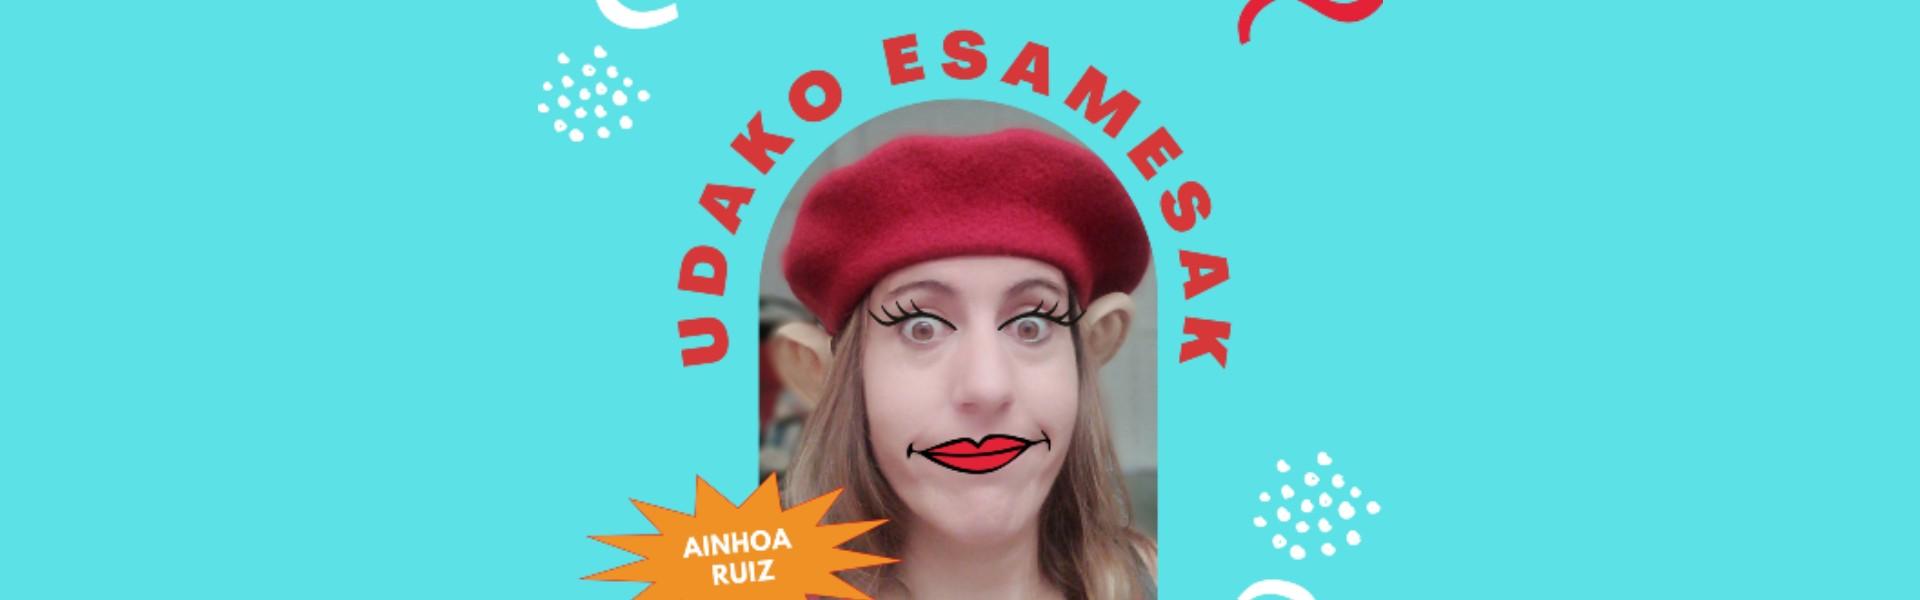 "Cuentacuentos: ""Udako esamesak"""